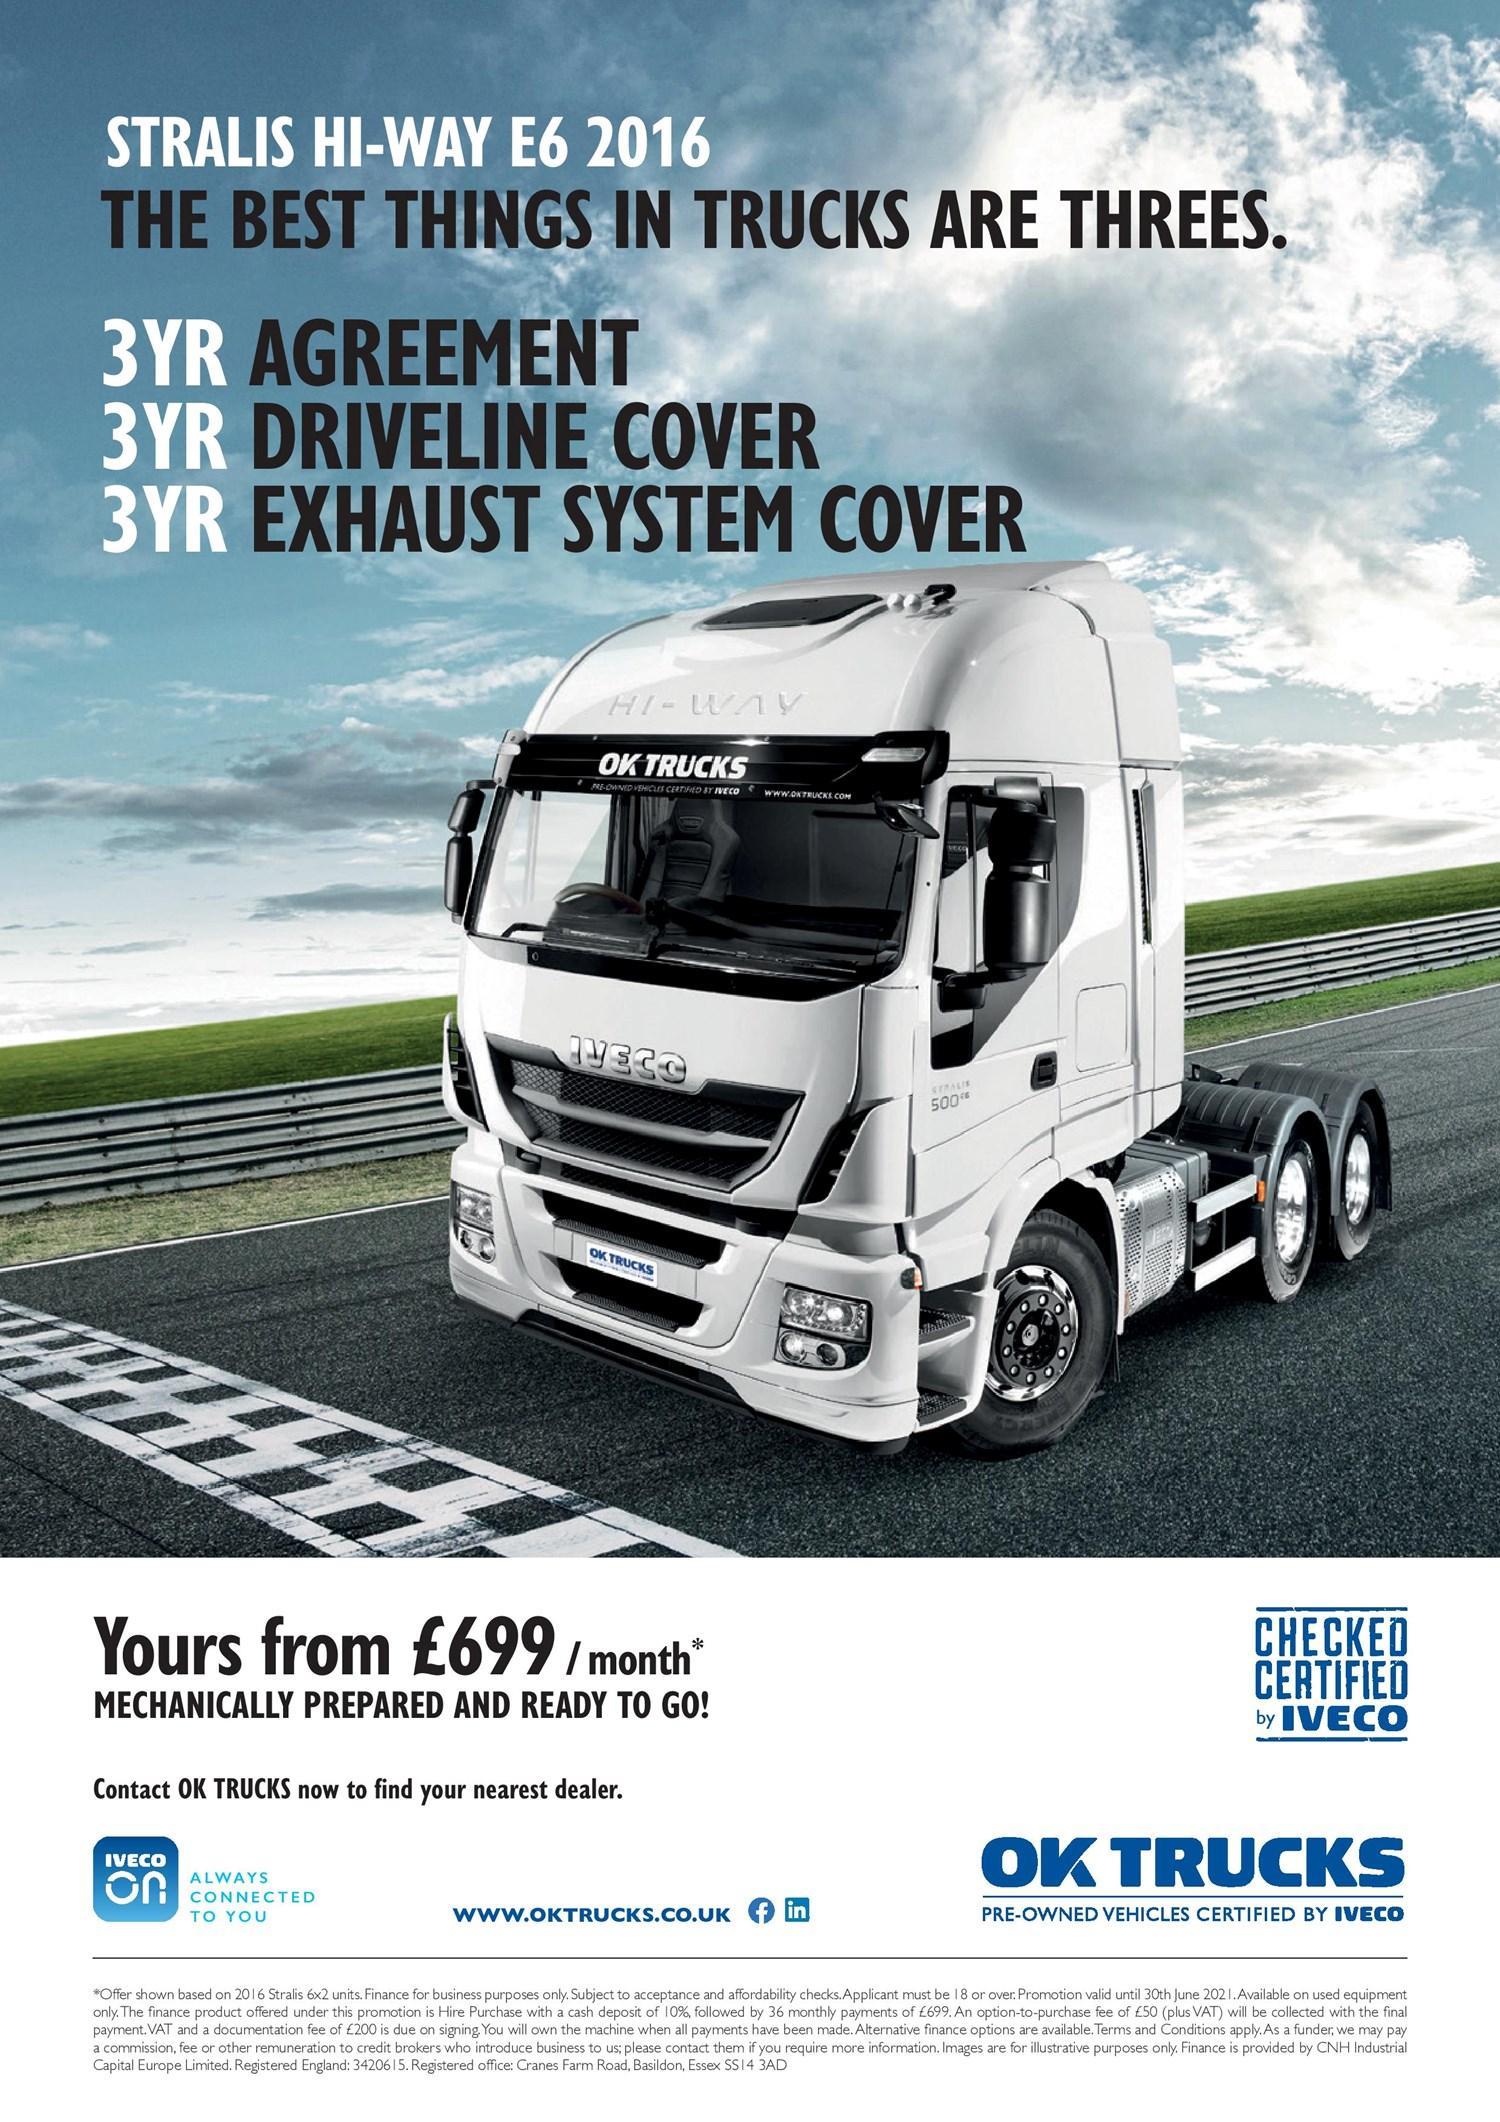 NETV OK Trucks £699 campaign